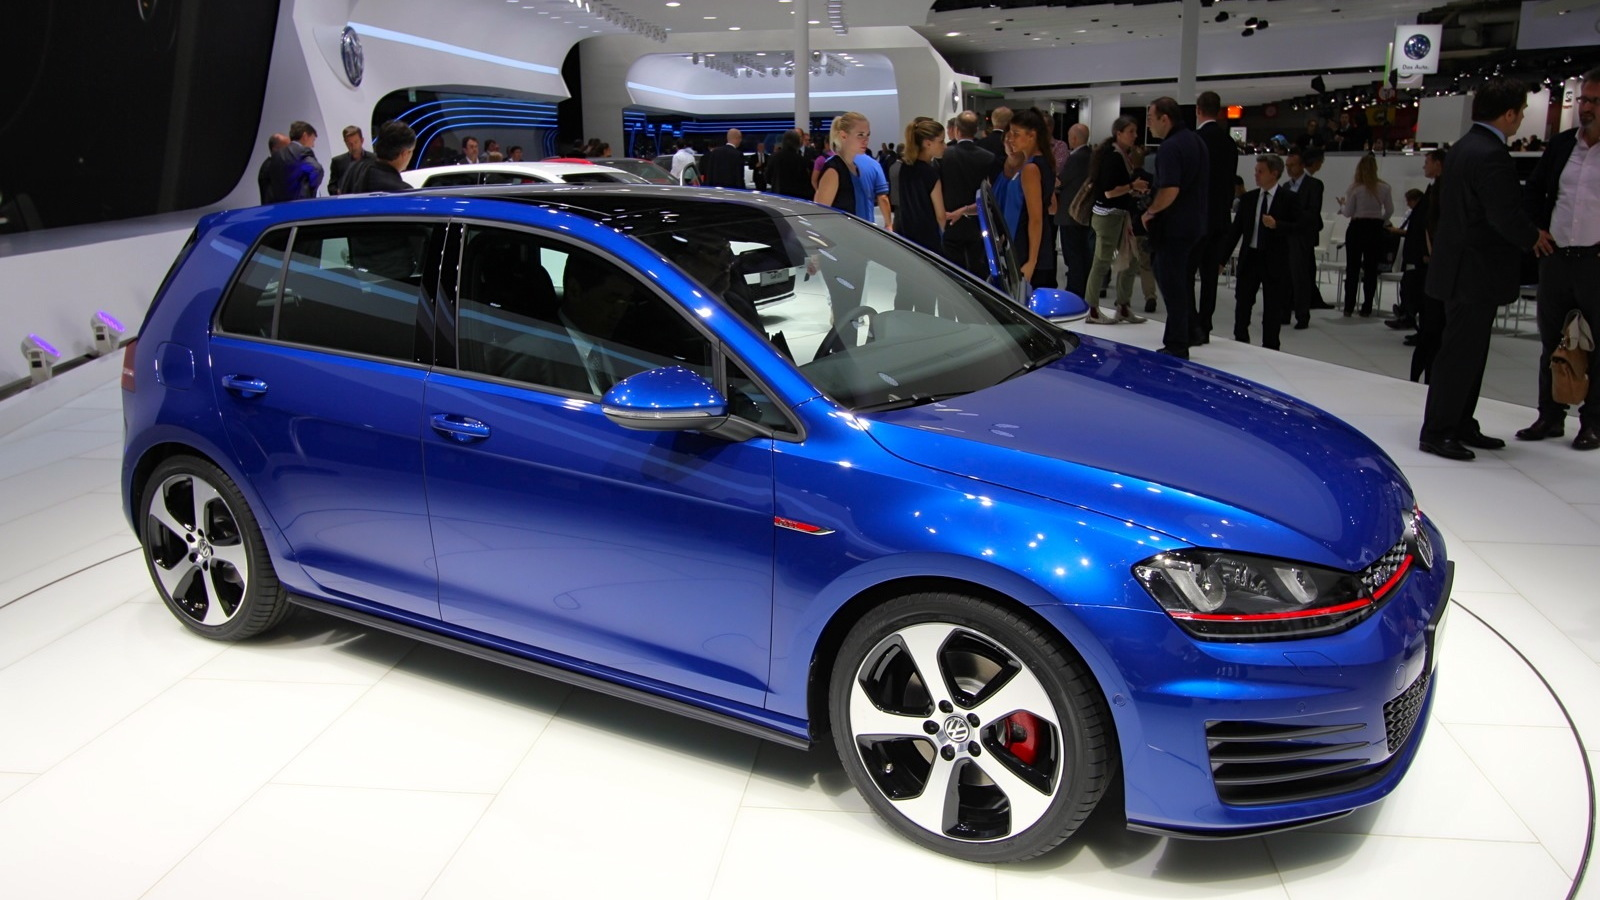 2014 Volkswagen GTI concept, 2012 Paris auto show